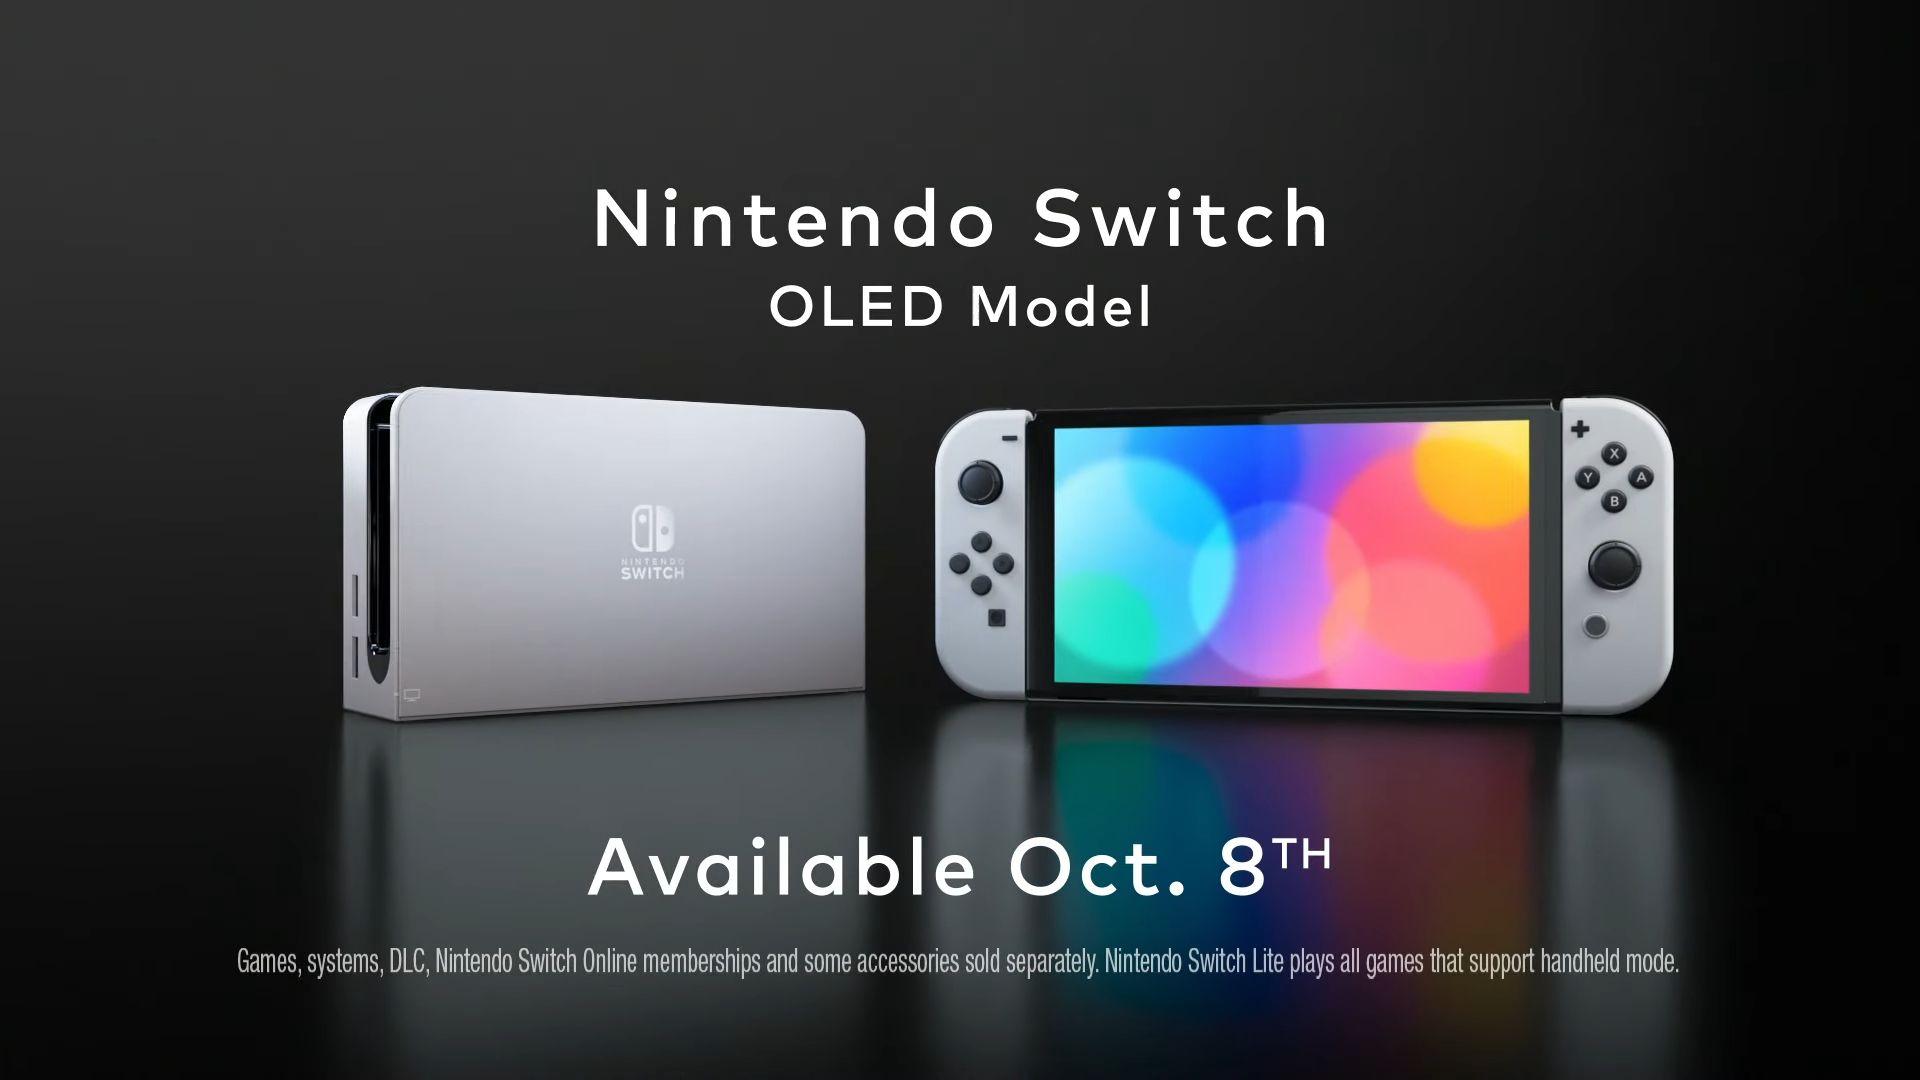 Nindendo Switch (OLED model) - releasedatum